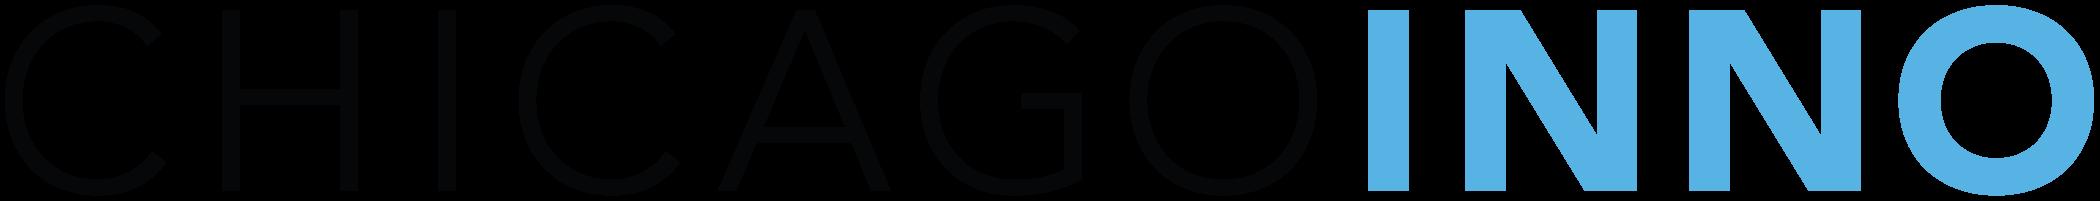 Chiinno logo